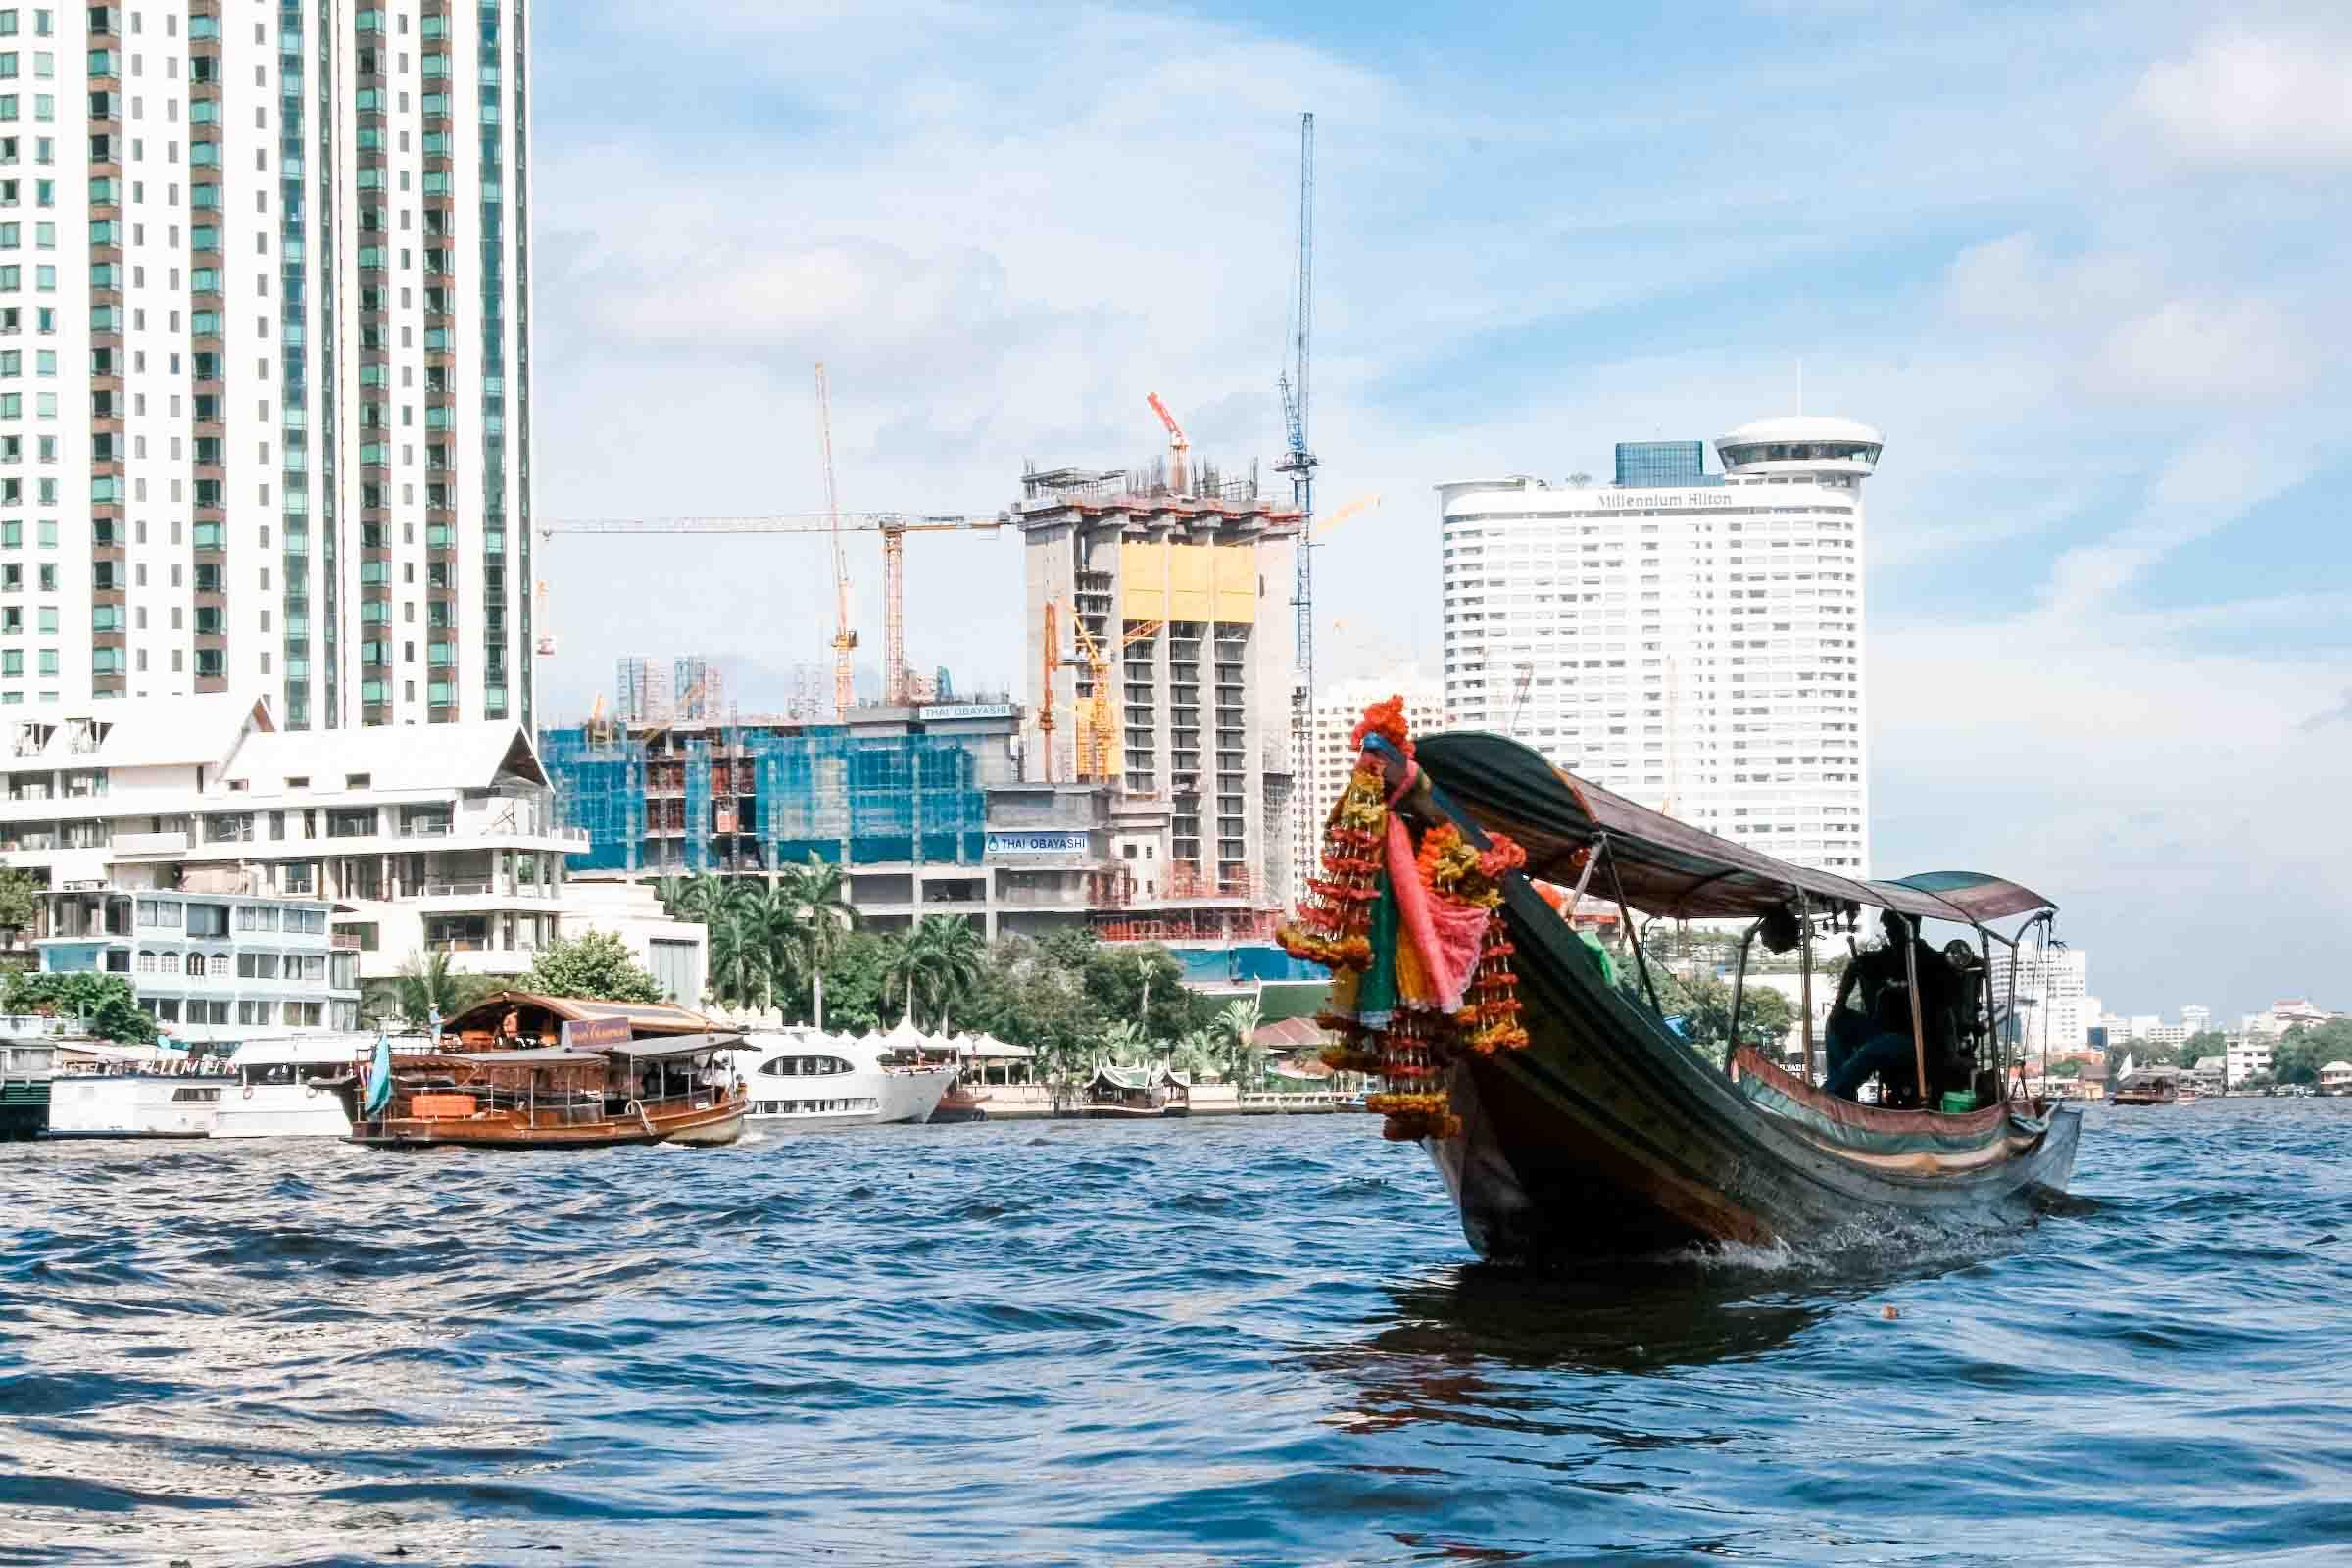 Bangkok 23timezones Flussfahrt